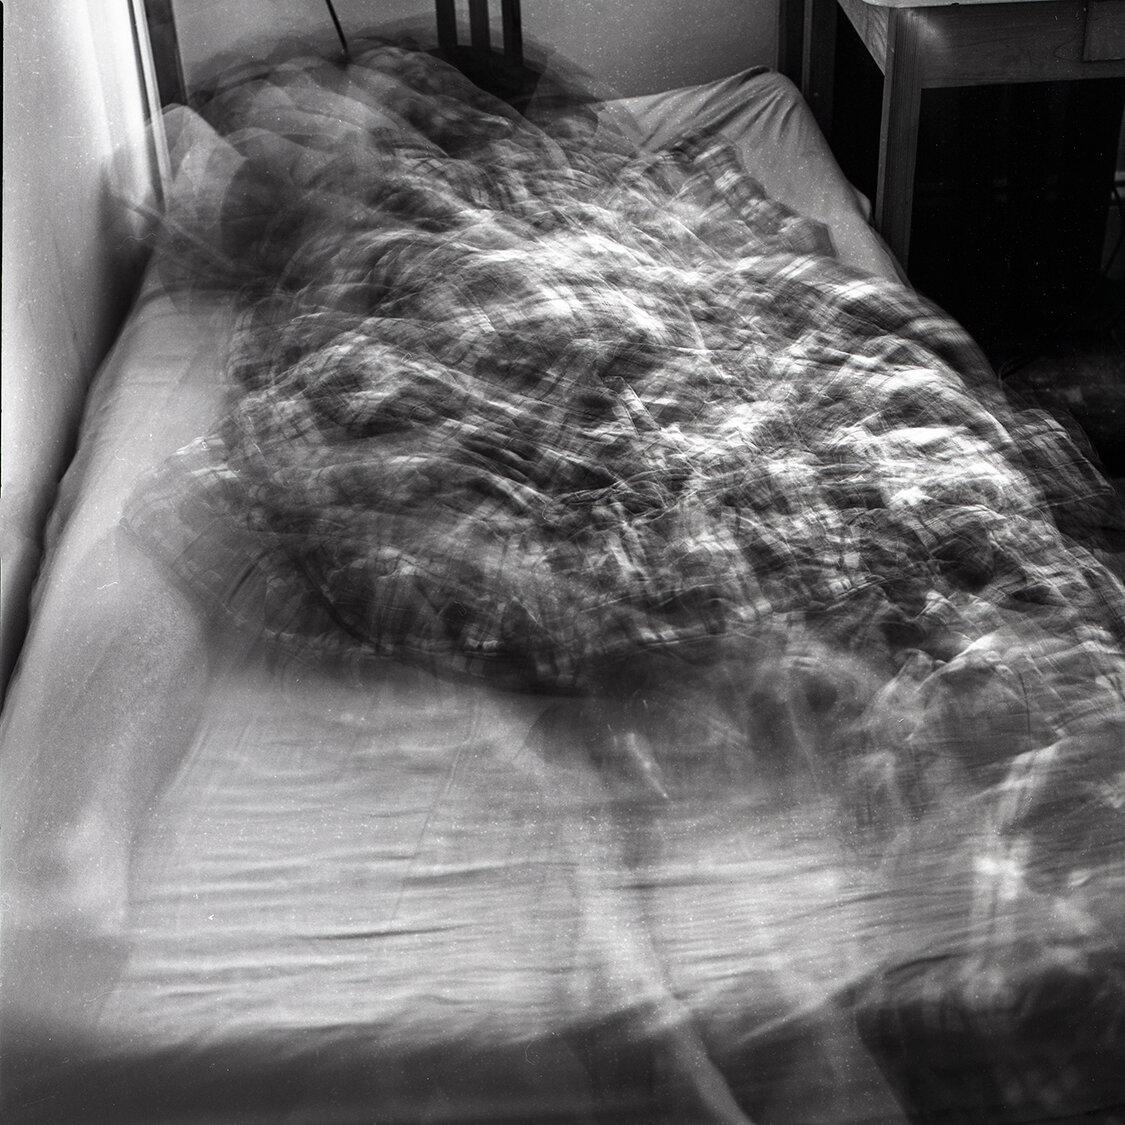 NICOLAI - My old bed 4 - nicolai gregory.jpg